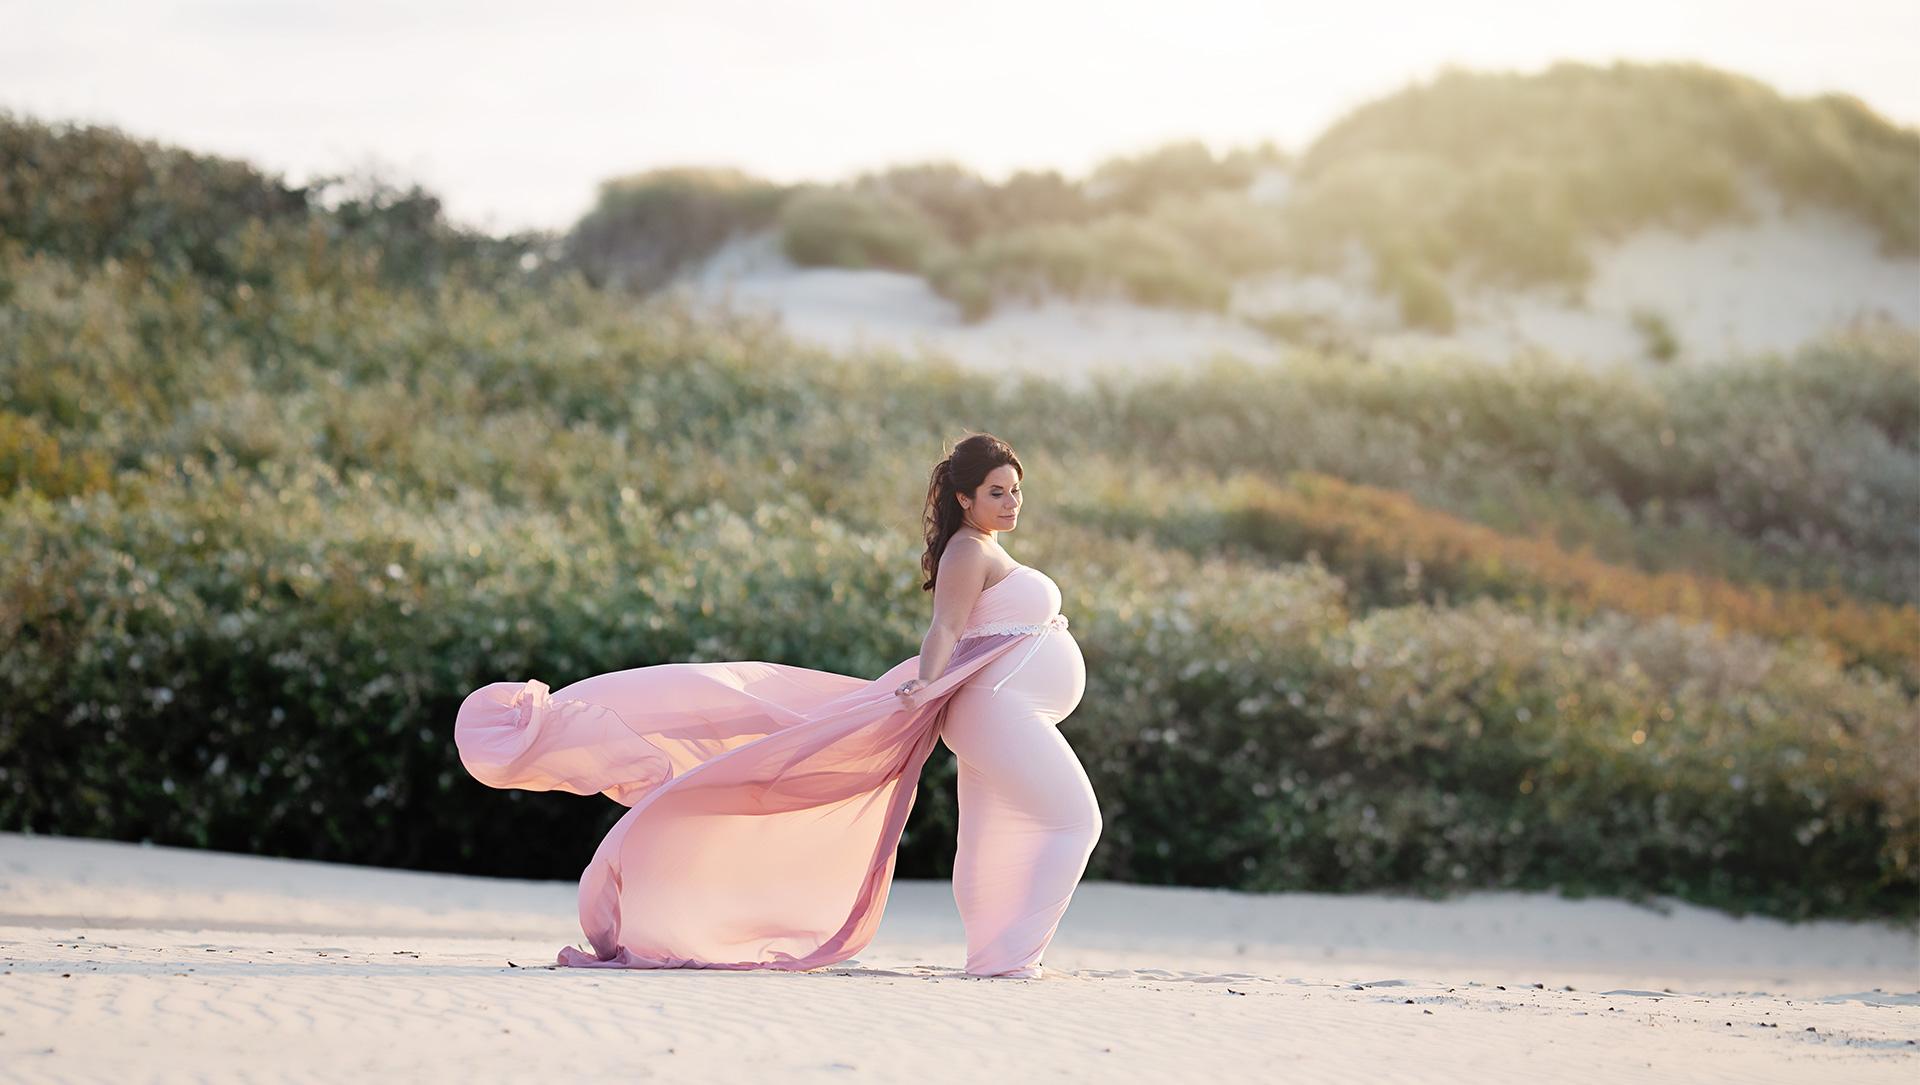 zwanger zwangerschap baby fotosessie fotoshoot rotterdam cappelle aan den ijssel den haag fotostudio sachin fotografie zuid holland fotosessie babyshower